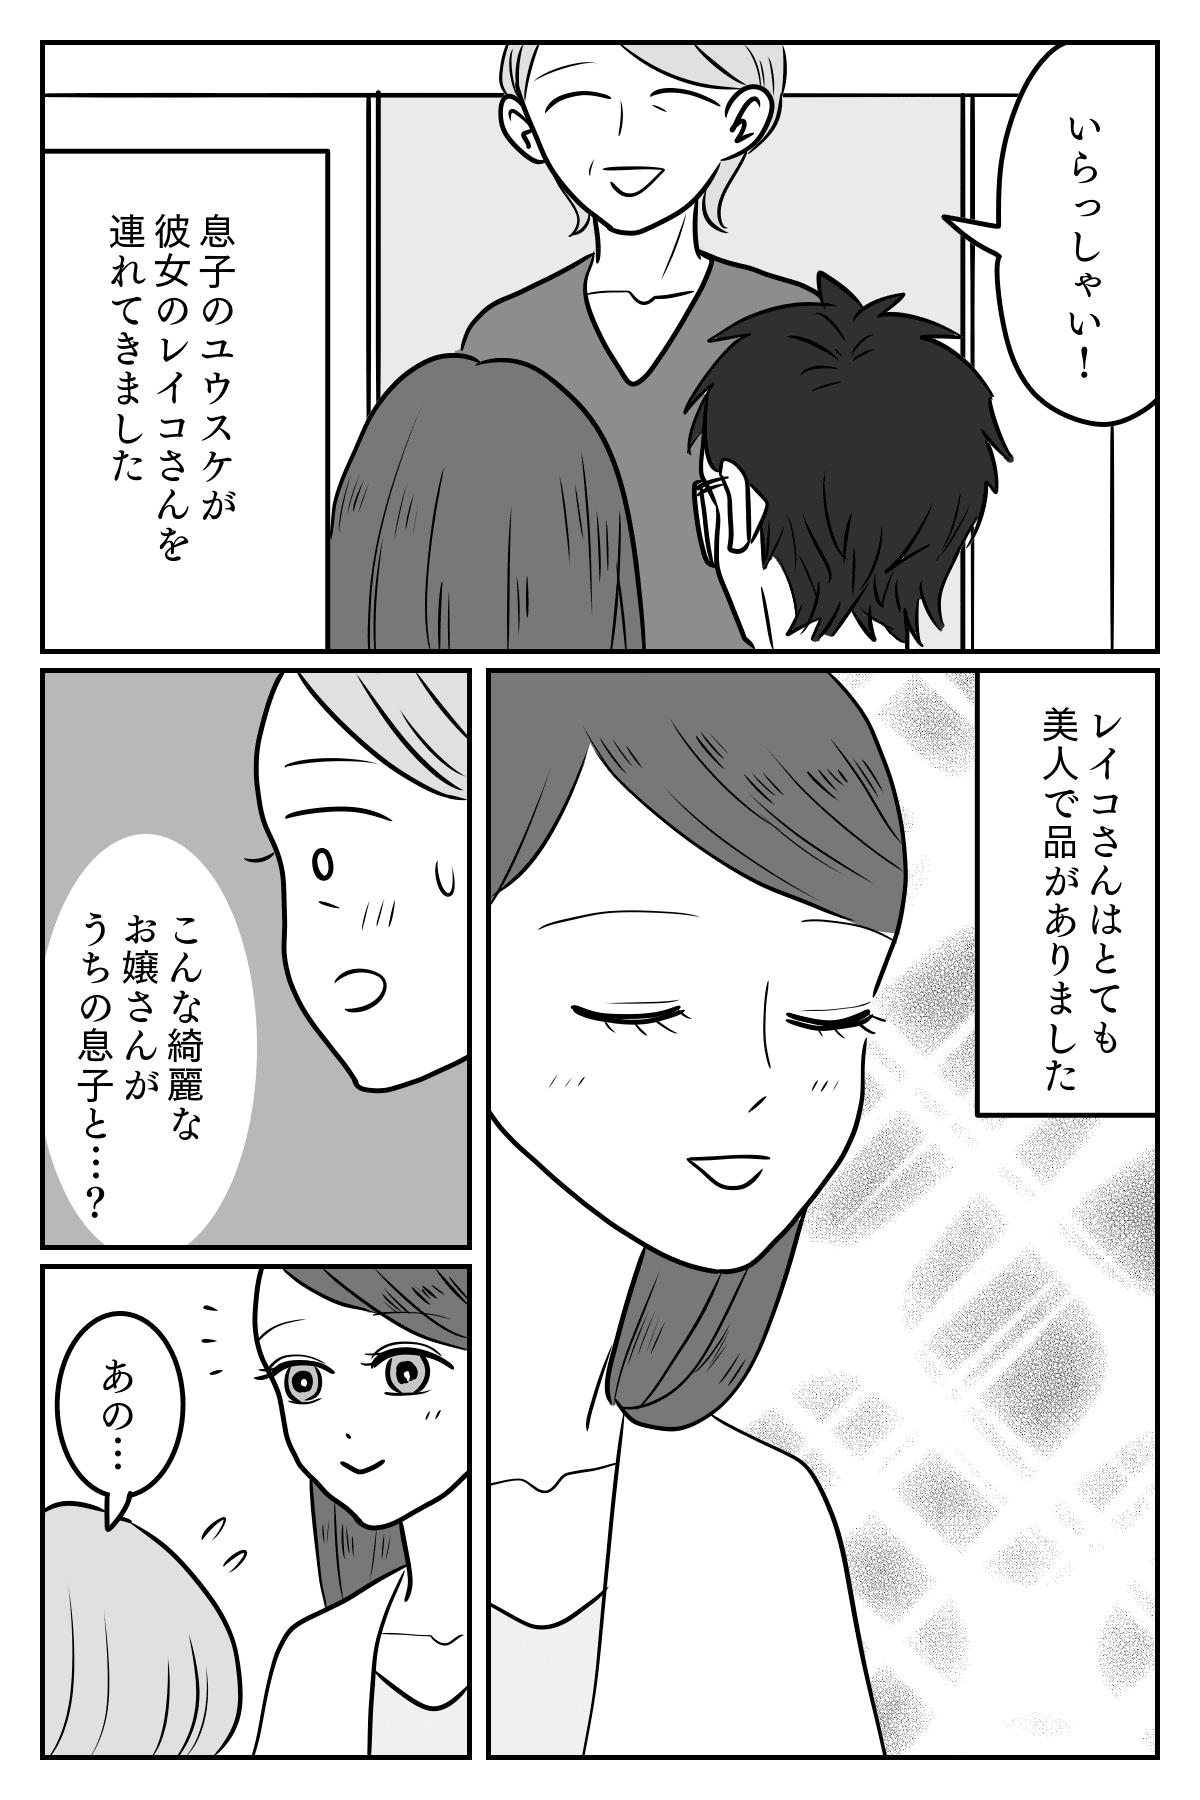 DV1-1